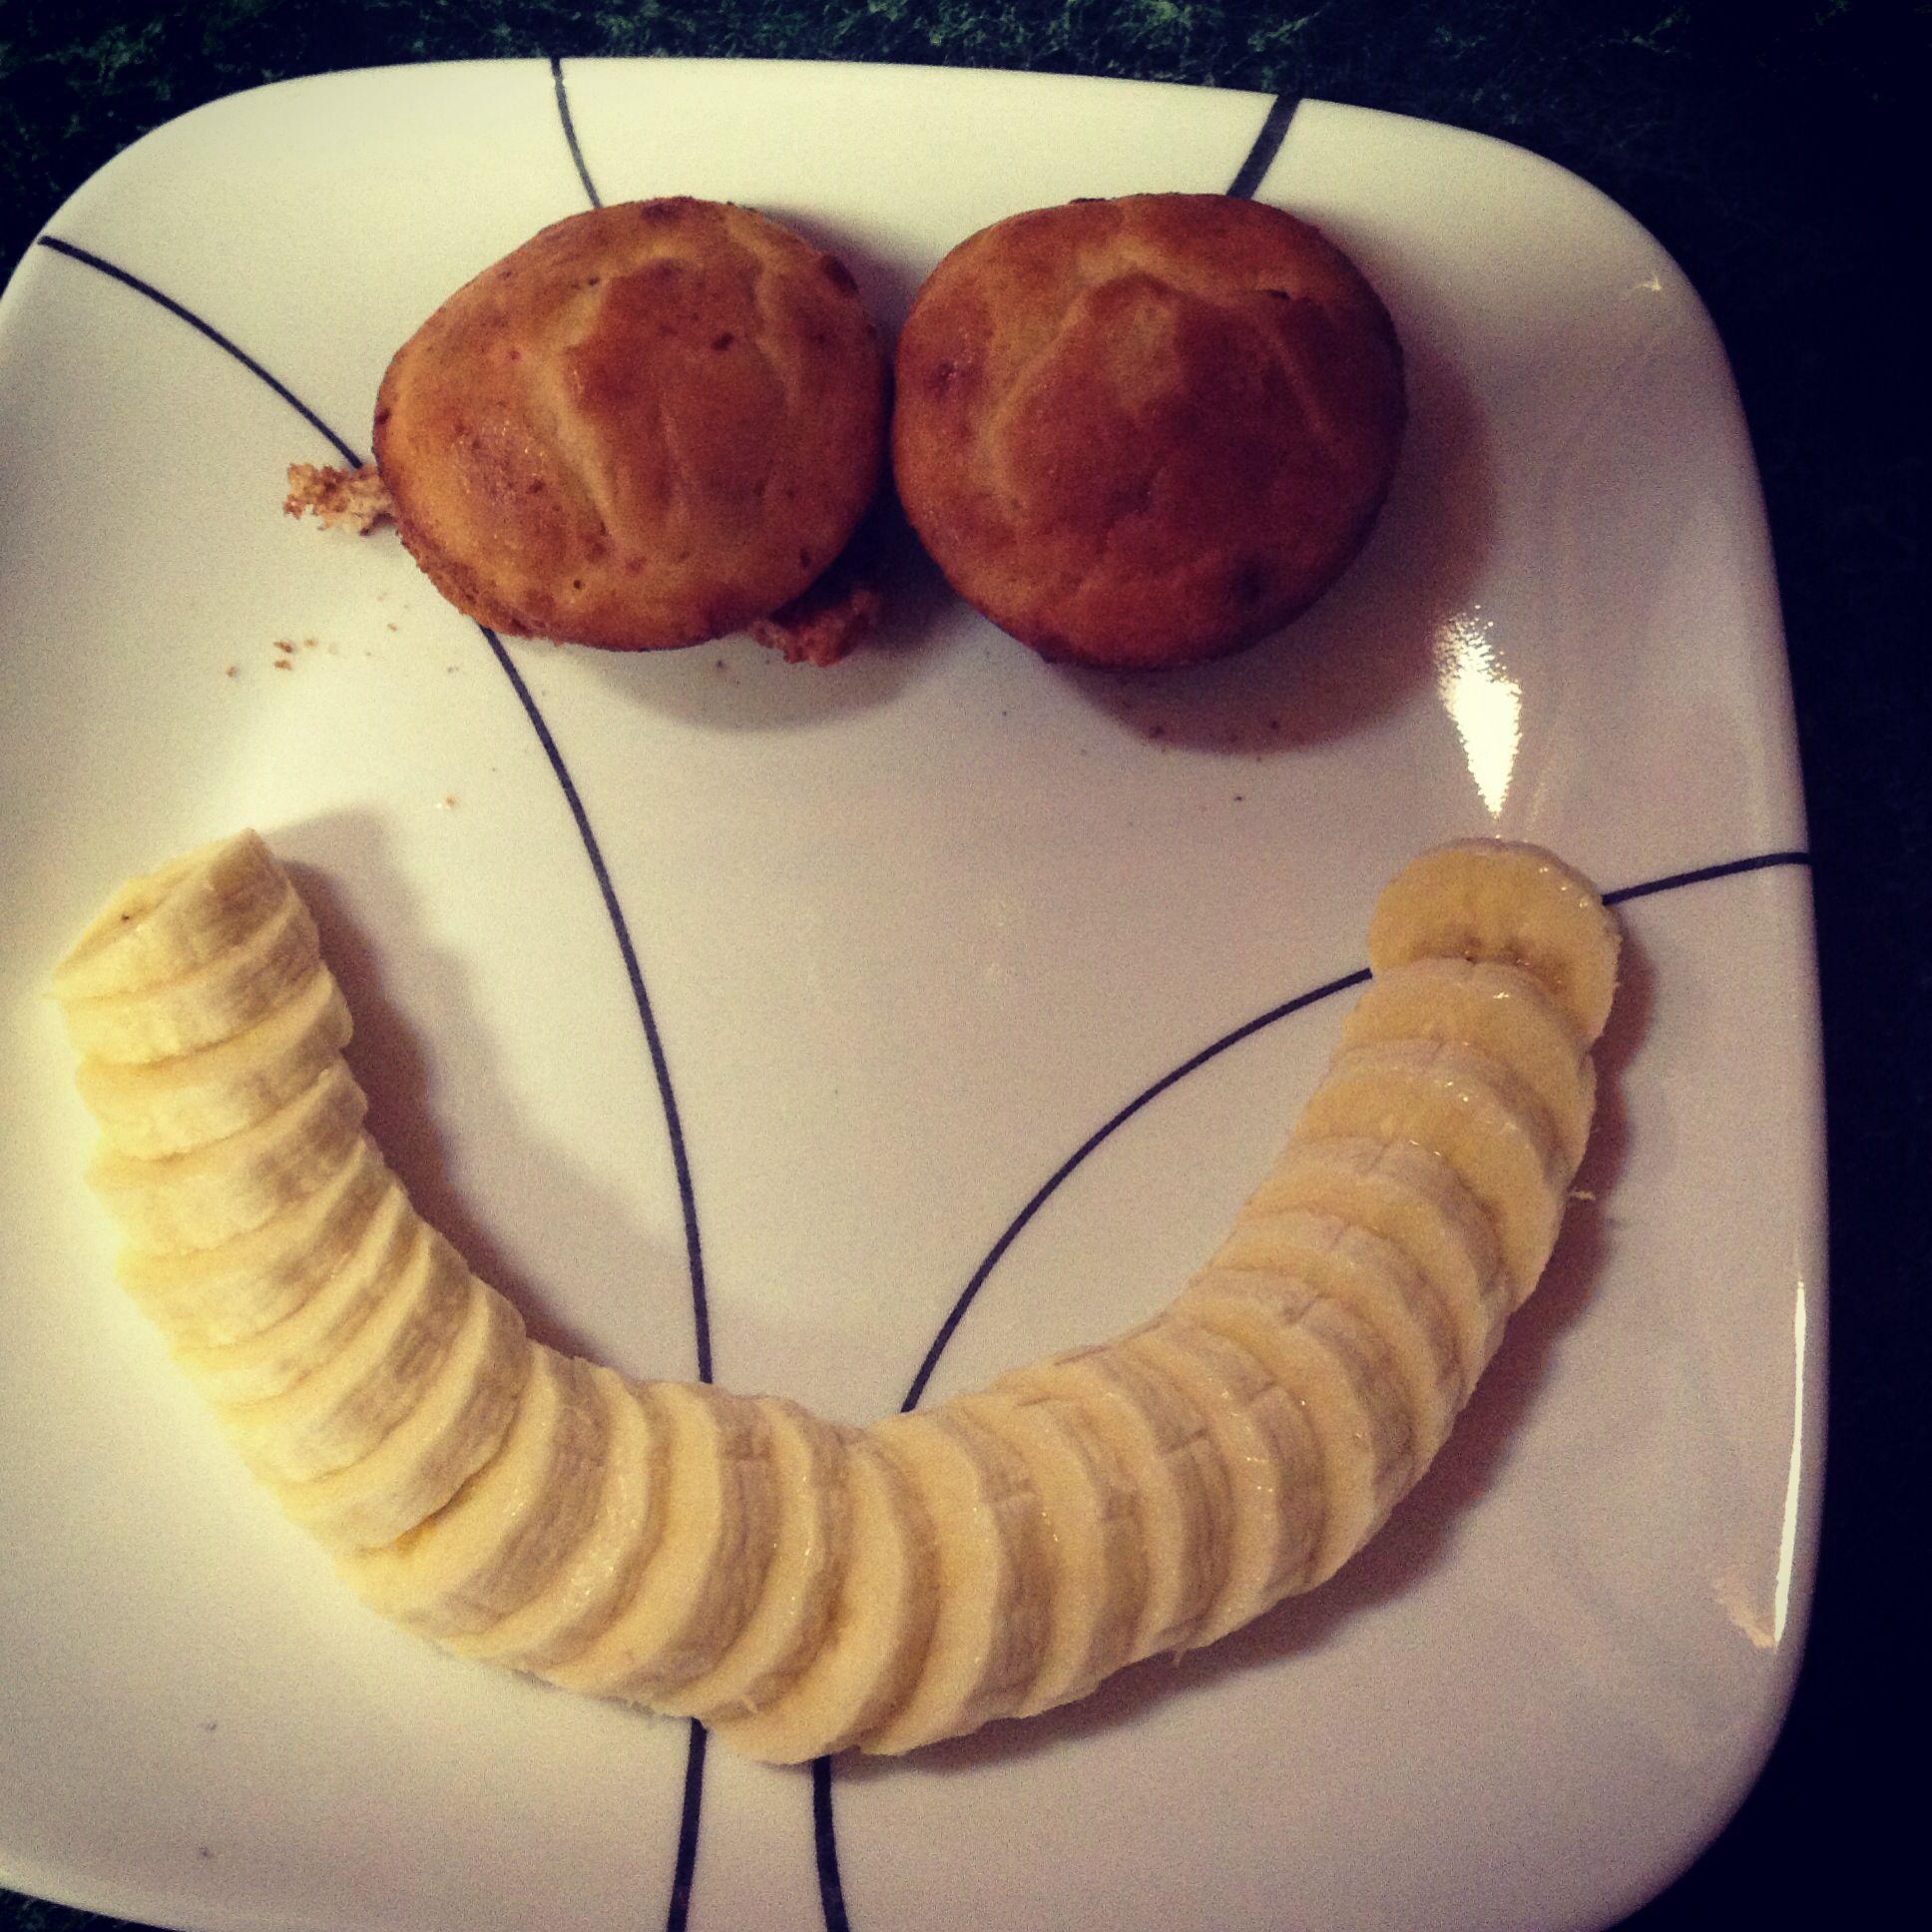 Pin by grace barnhouse on food food fruit pear